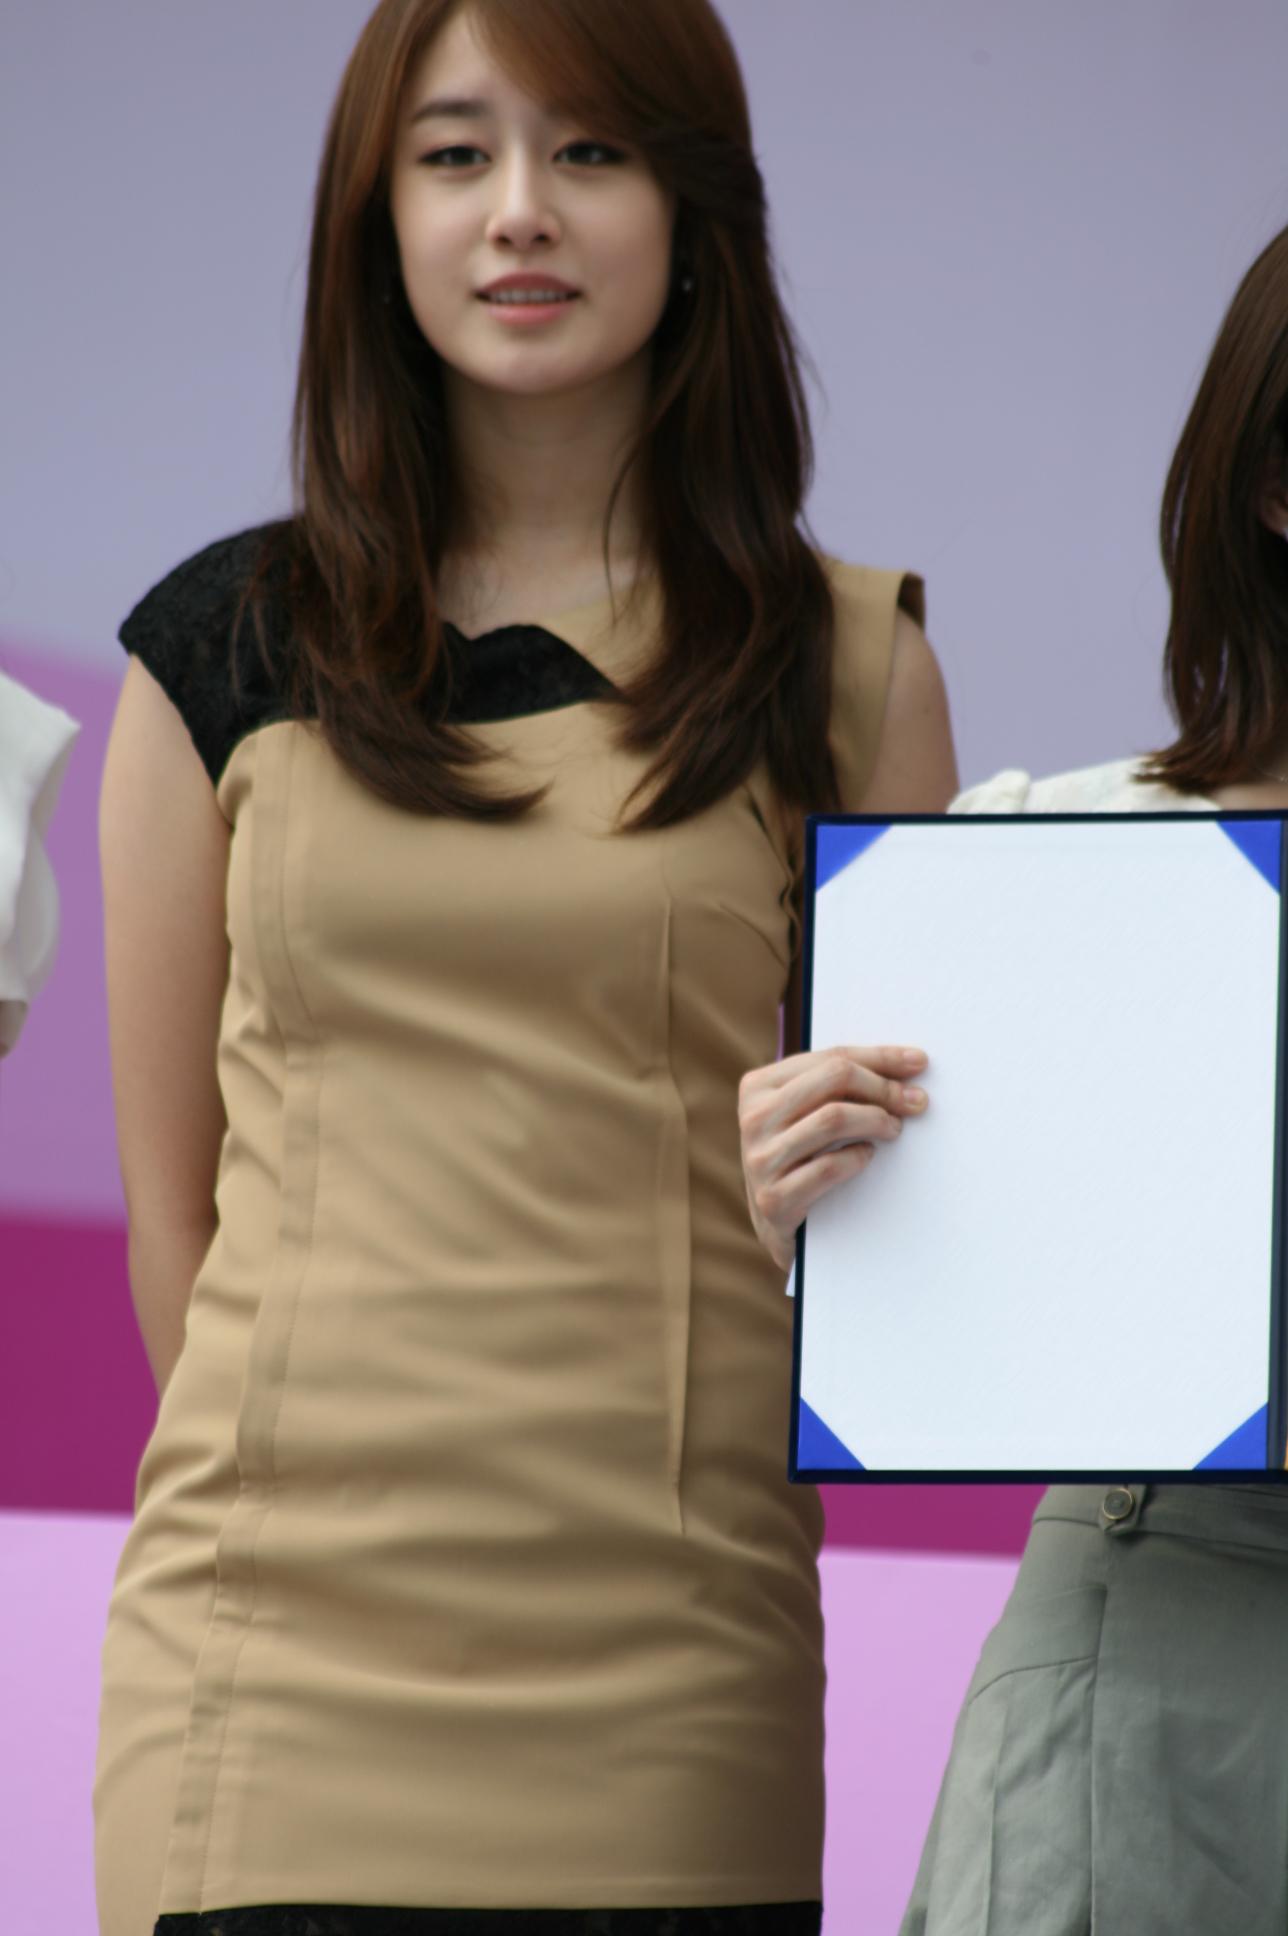 Park jiyeon and lee dong gun dating 2